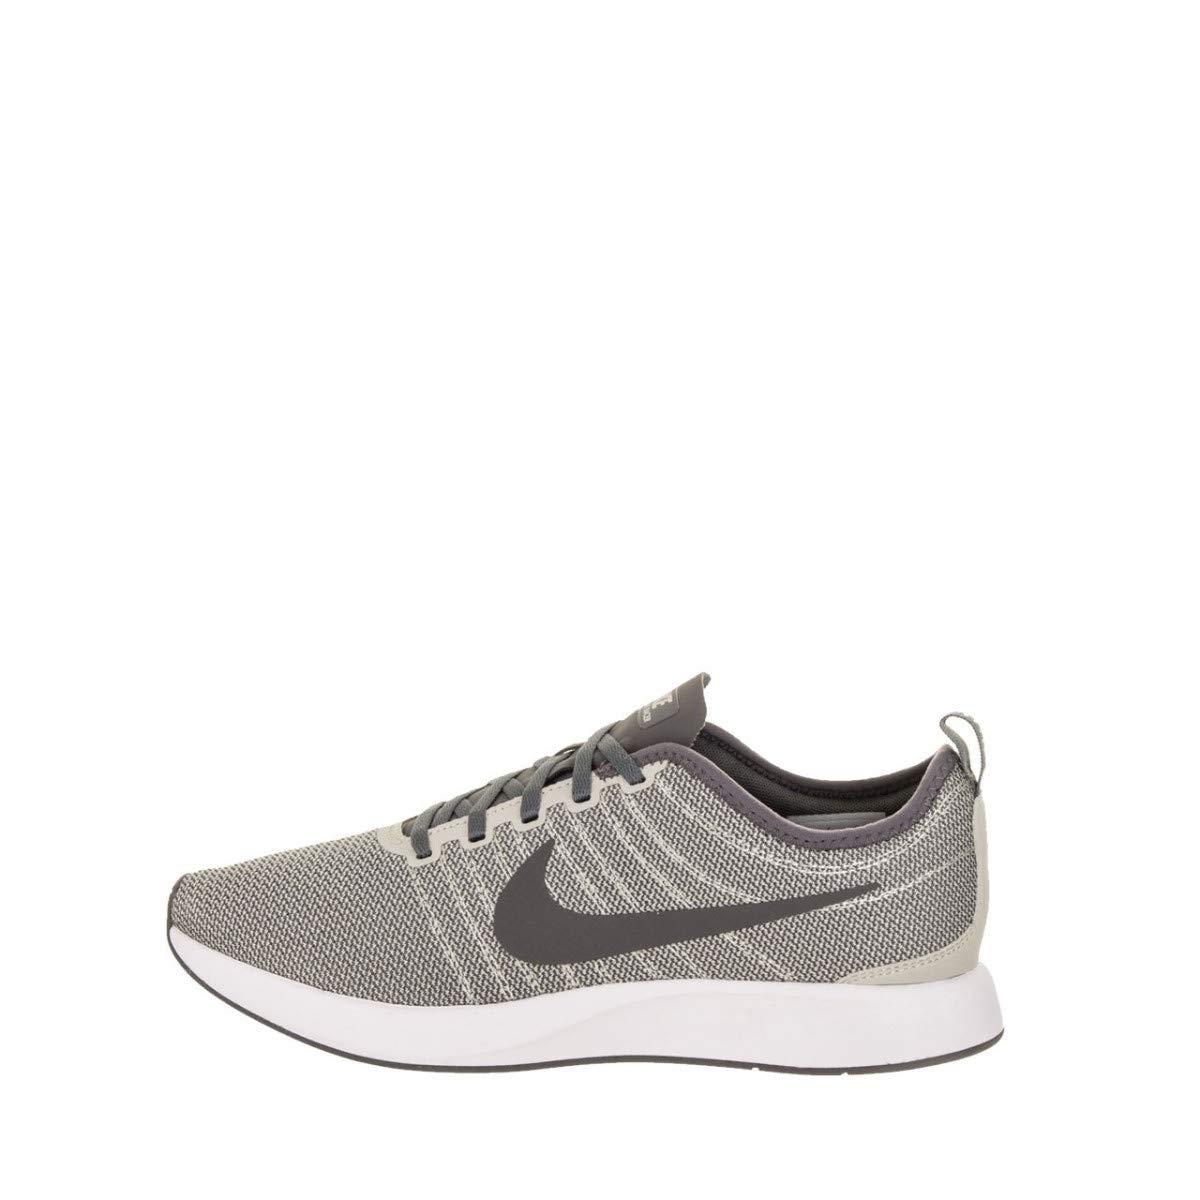 innovative design 072c5 ecba8 Galleon - Nike Men's Dualtone Racer Pale Grey 918227-003 (Size: 12)